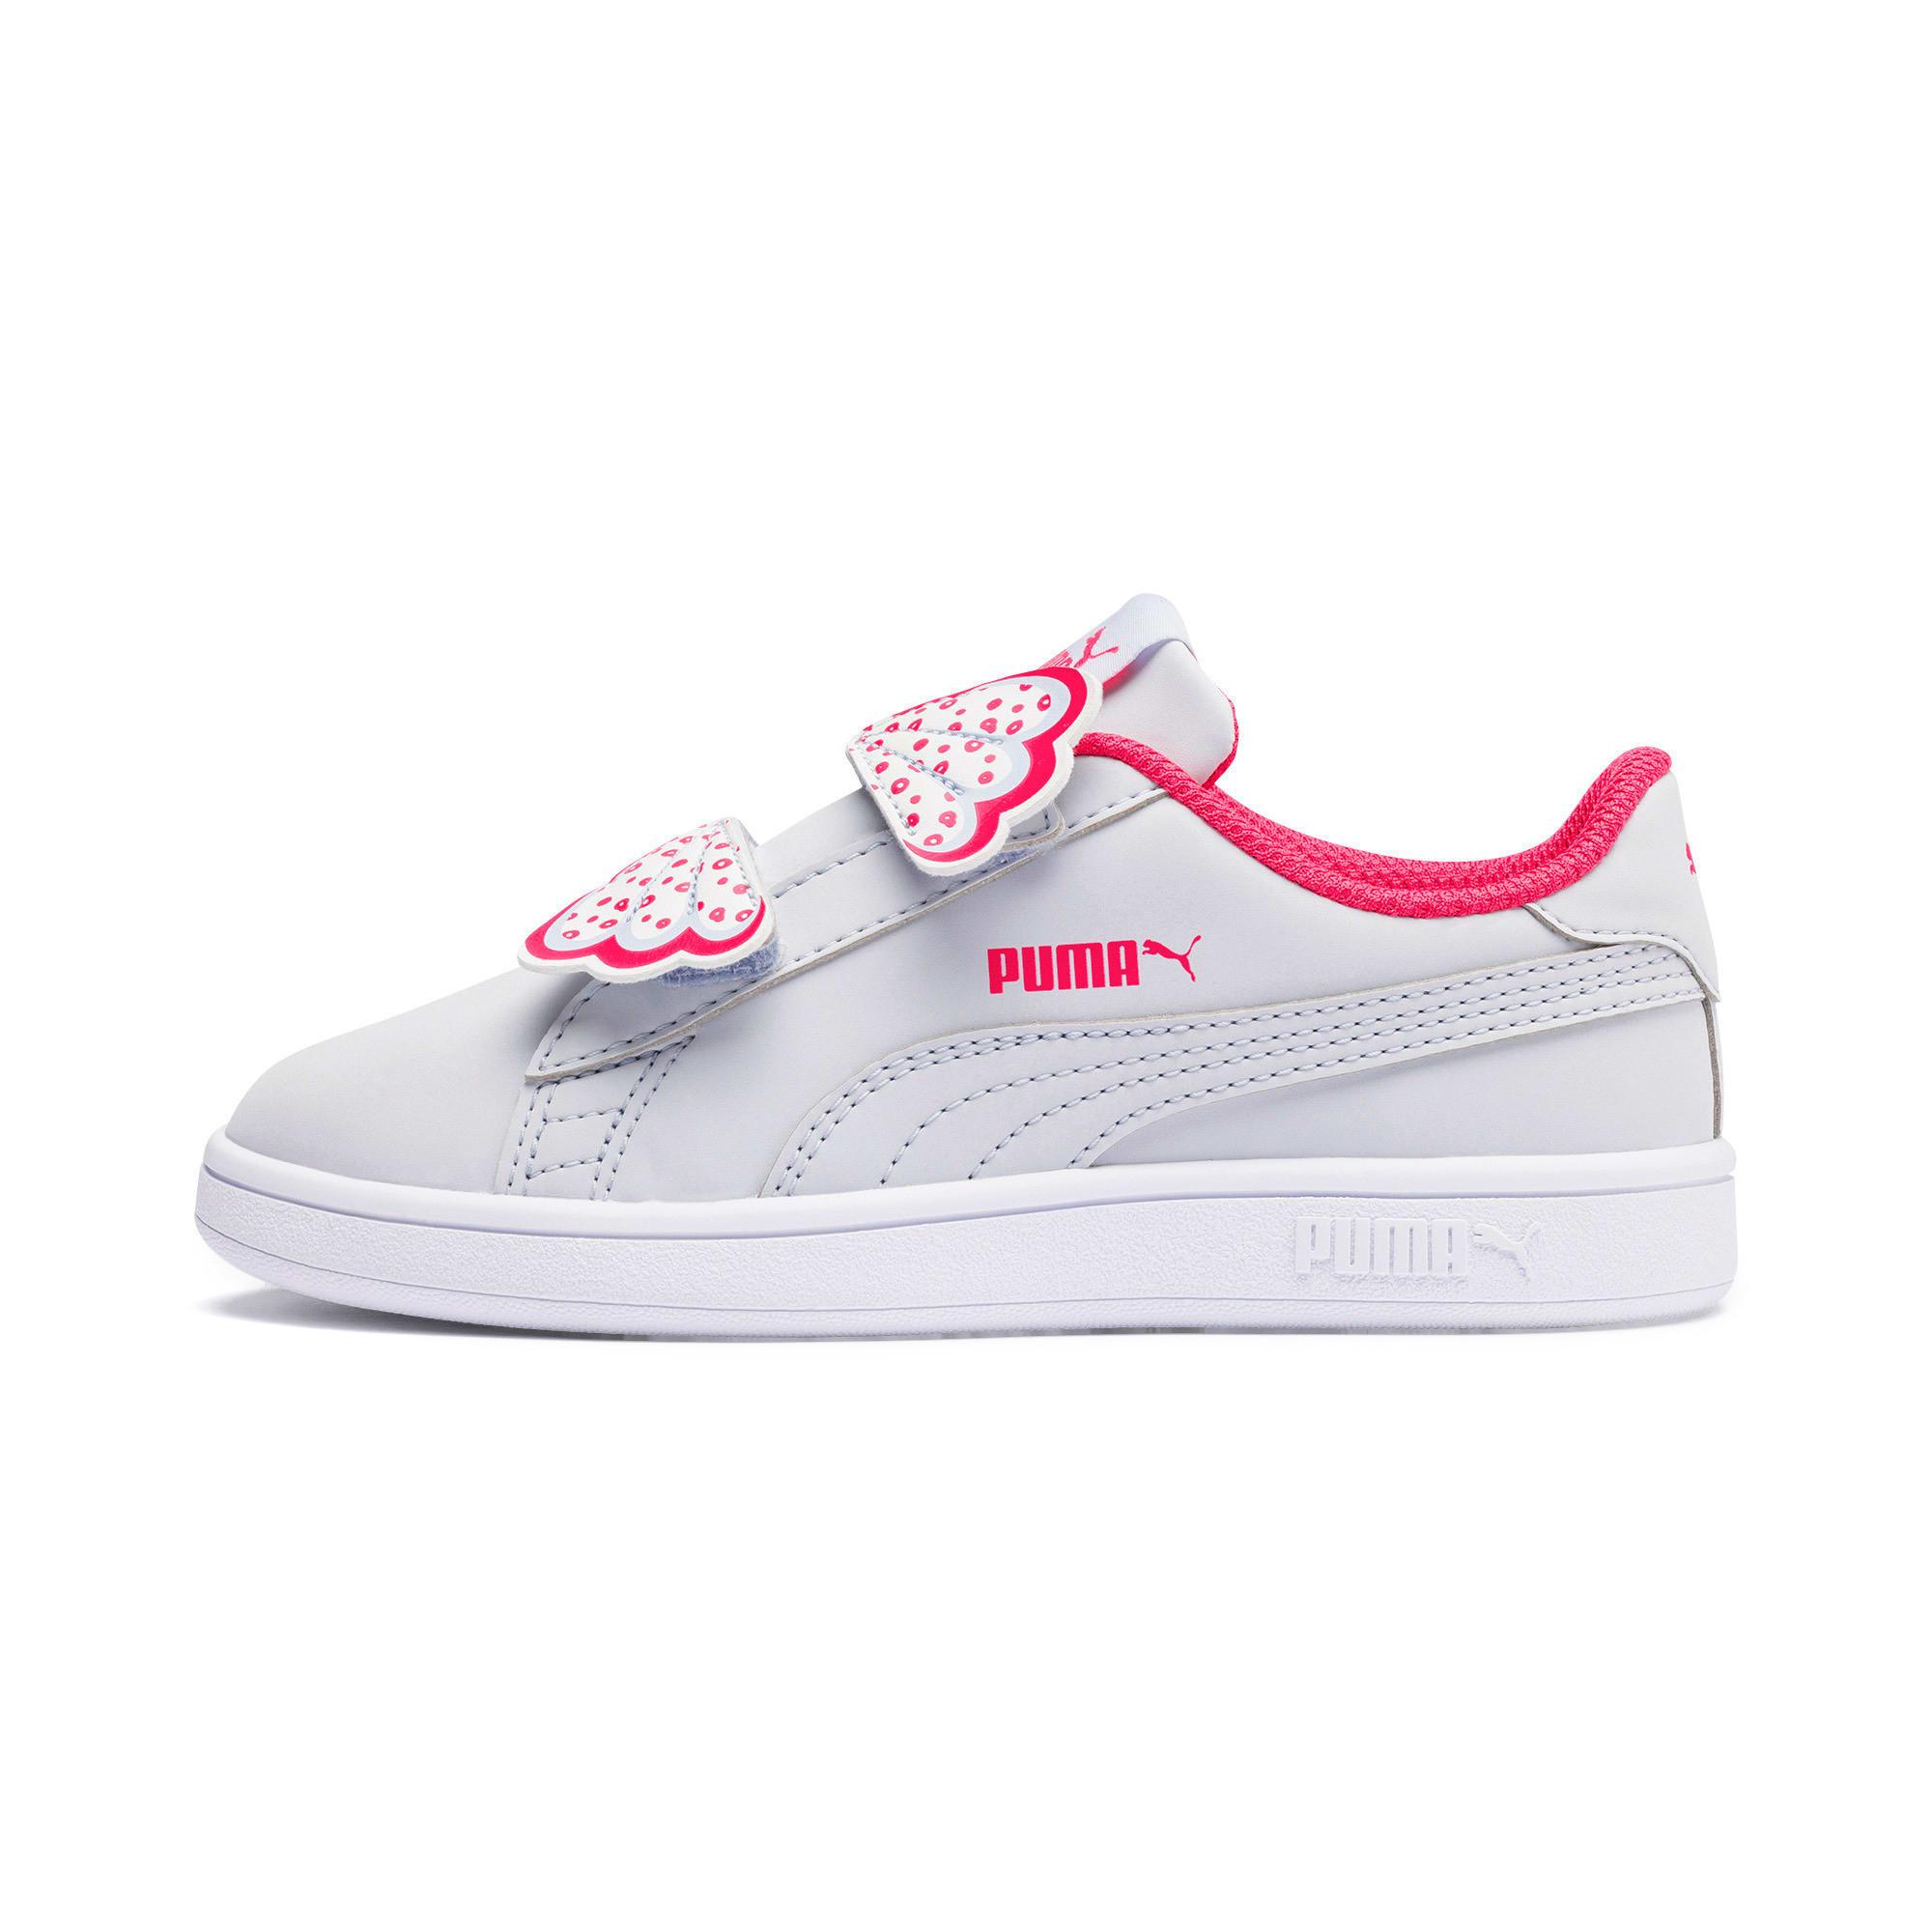 Thumbnail 1 of Puma Smash v2 Butterfly Little Kids' Shoes, Heather-Nrgy Rose-Puma White, medium